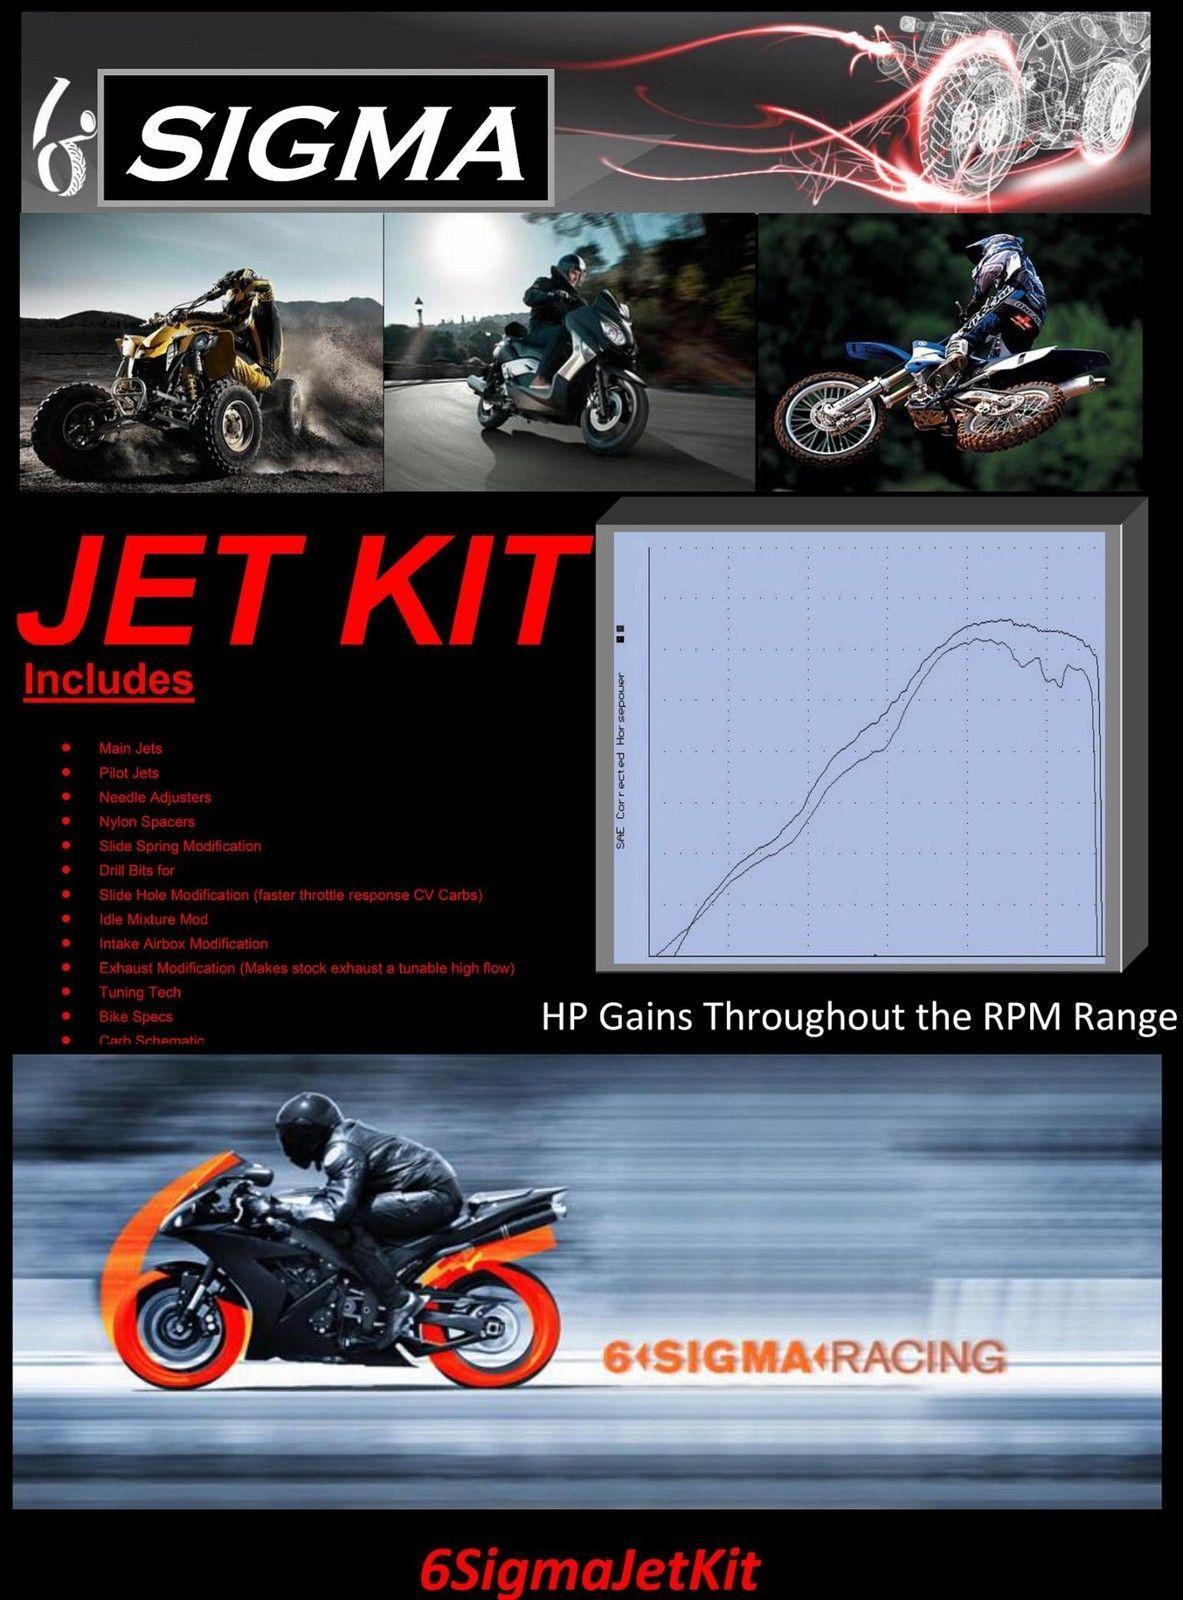 Kawasaki Mule 550 4x4 UTV KAF300 Side x Side Carburetor Carb Stage 1-3 Jet Kit